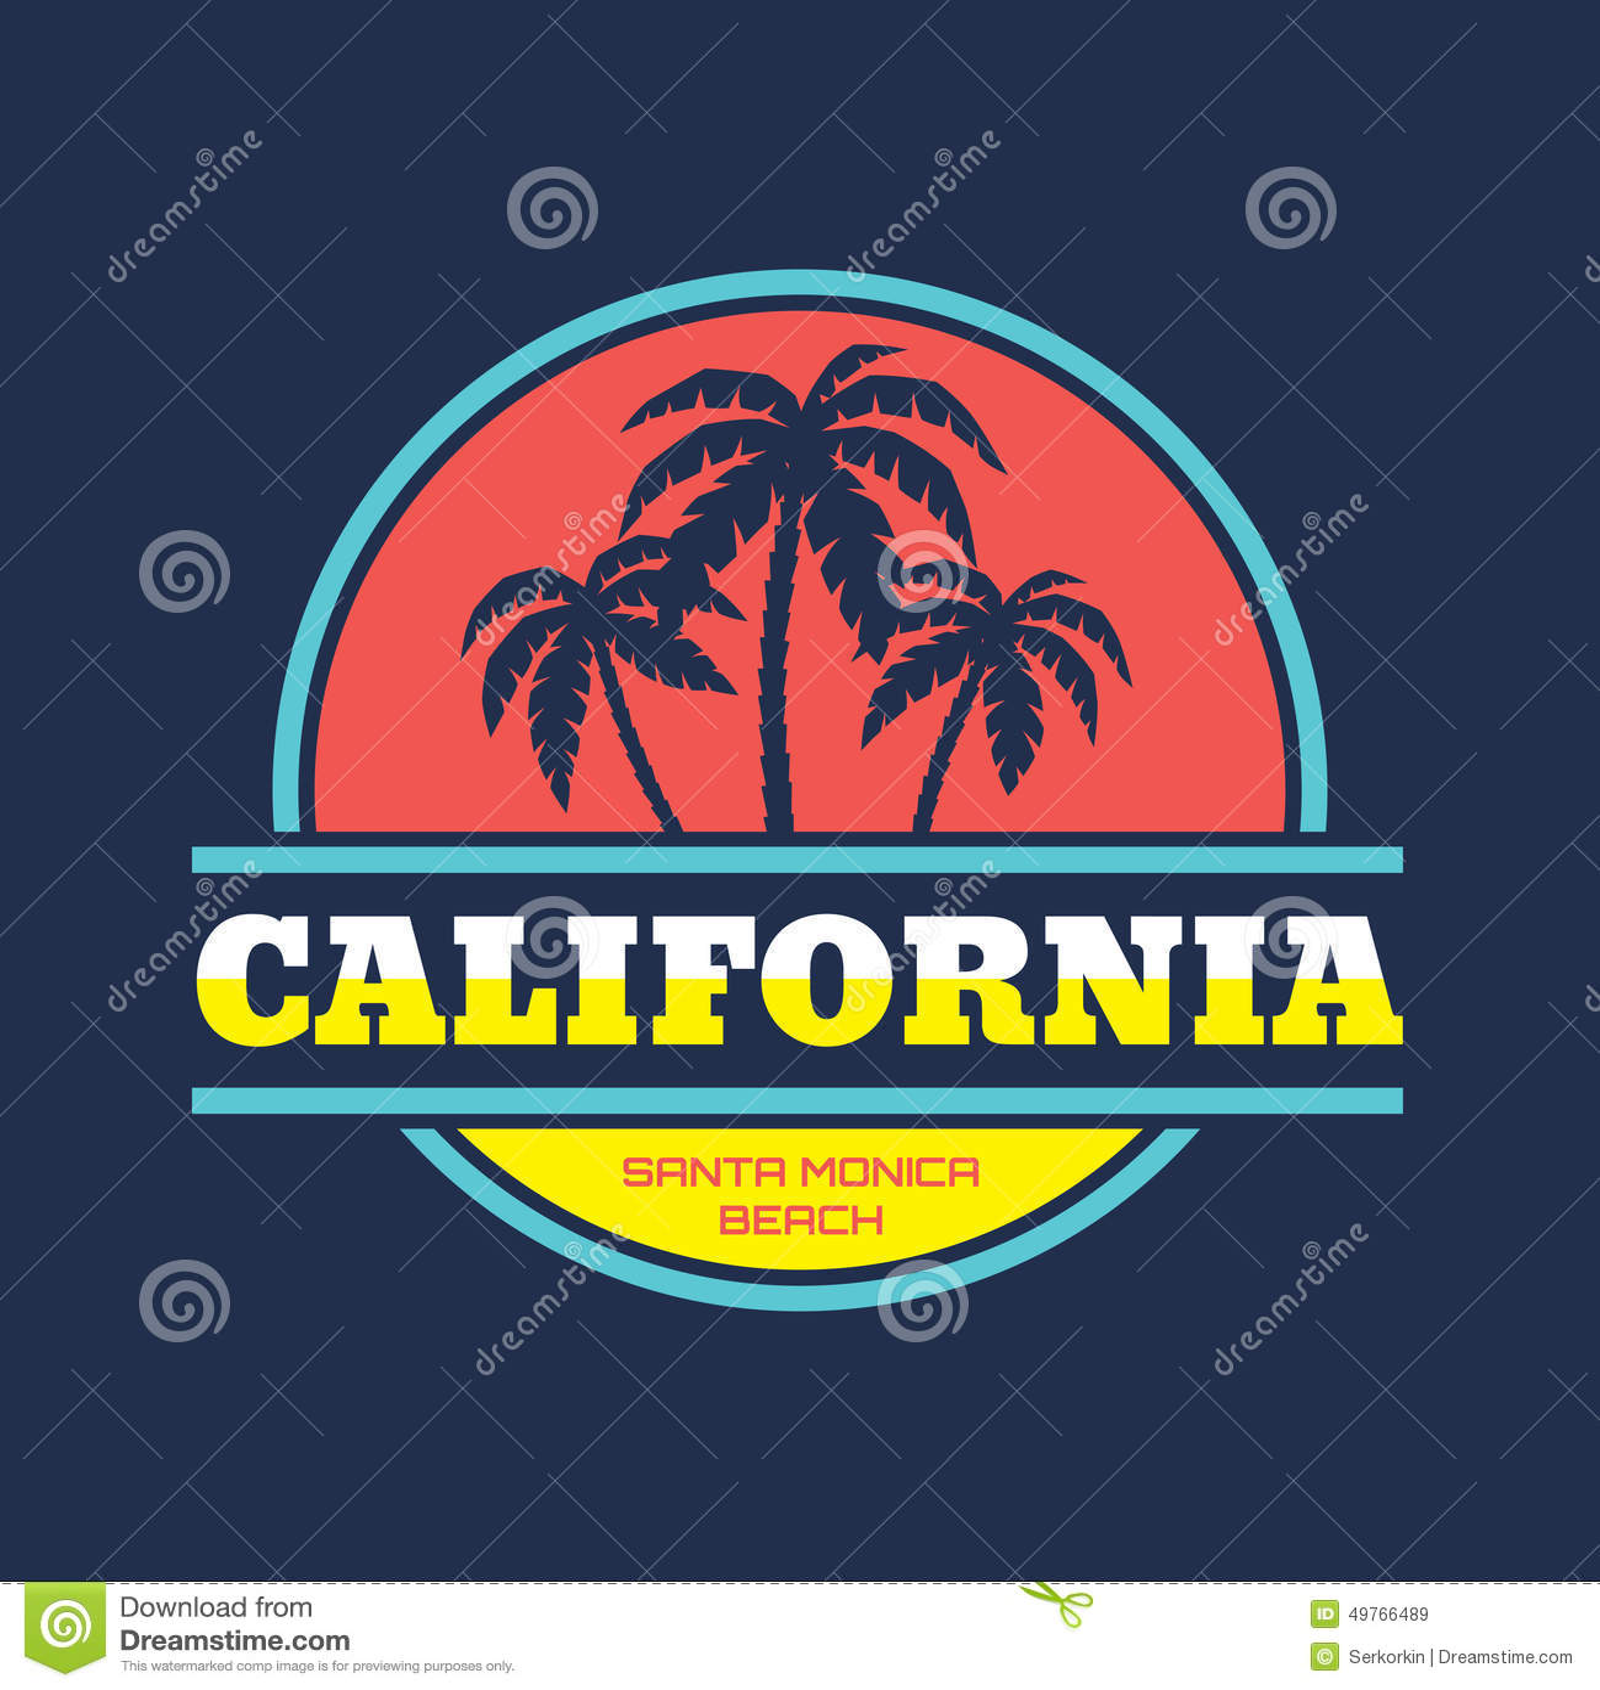 California Santa Monica Beach Vector Illustration Concept In